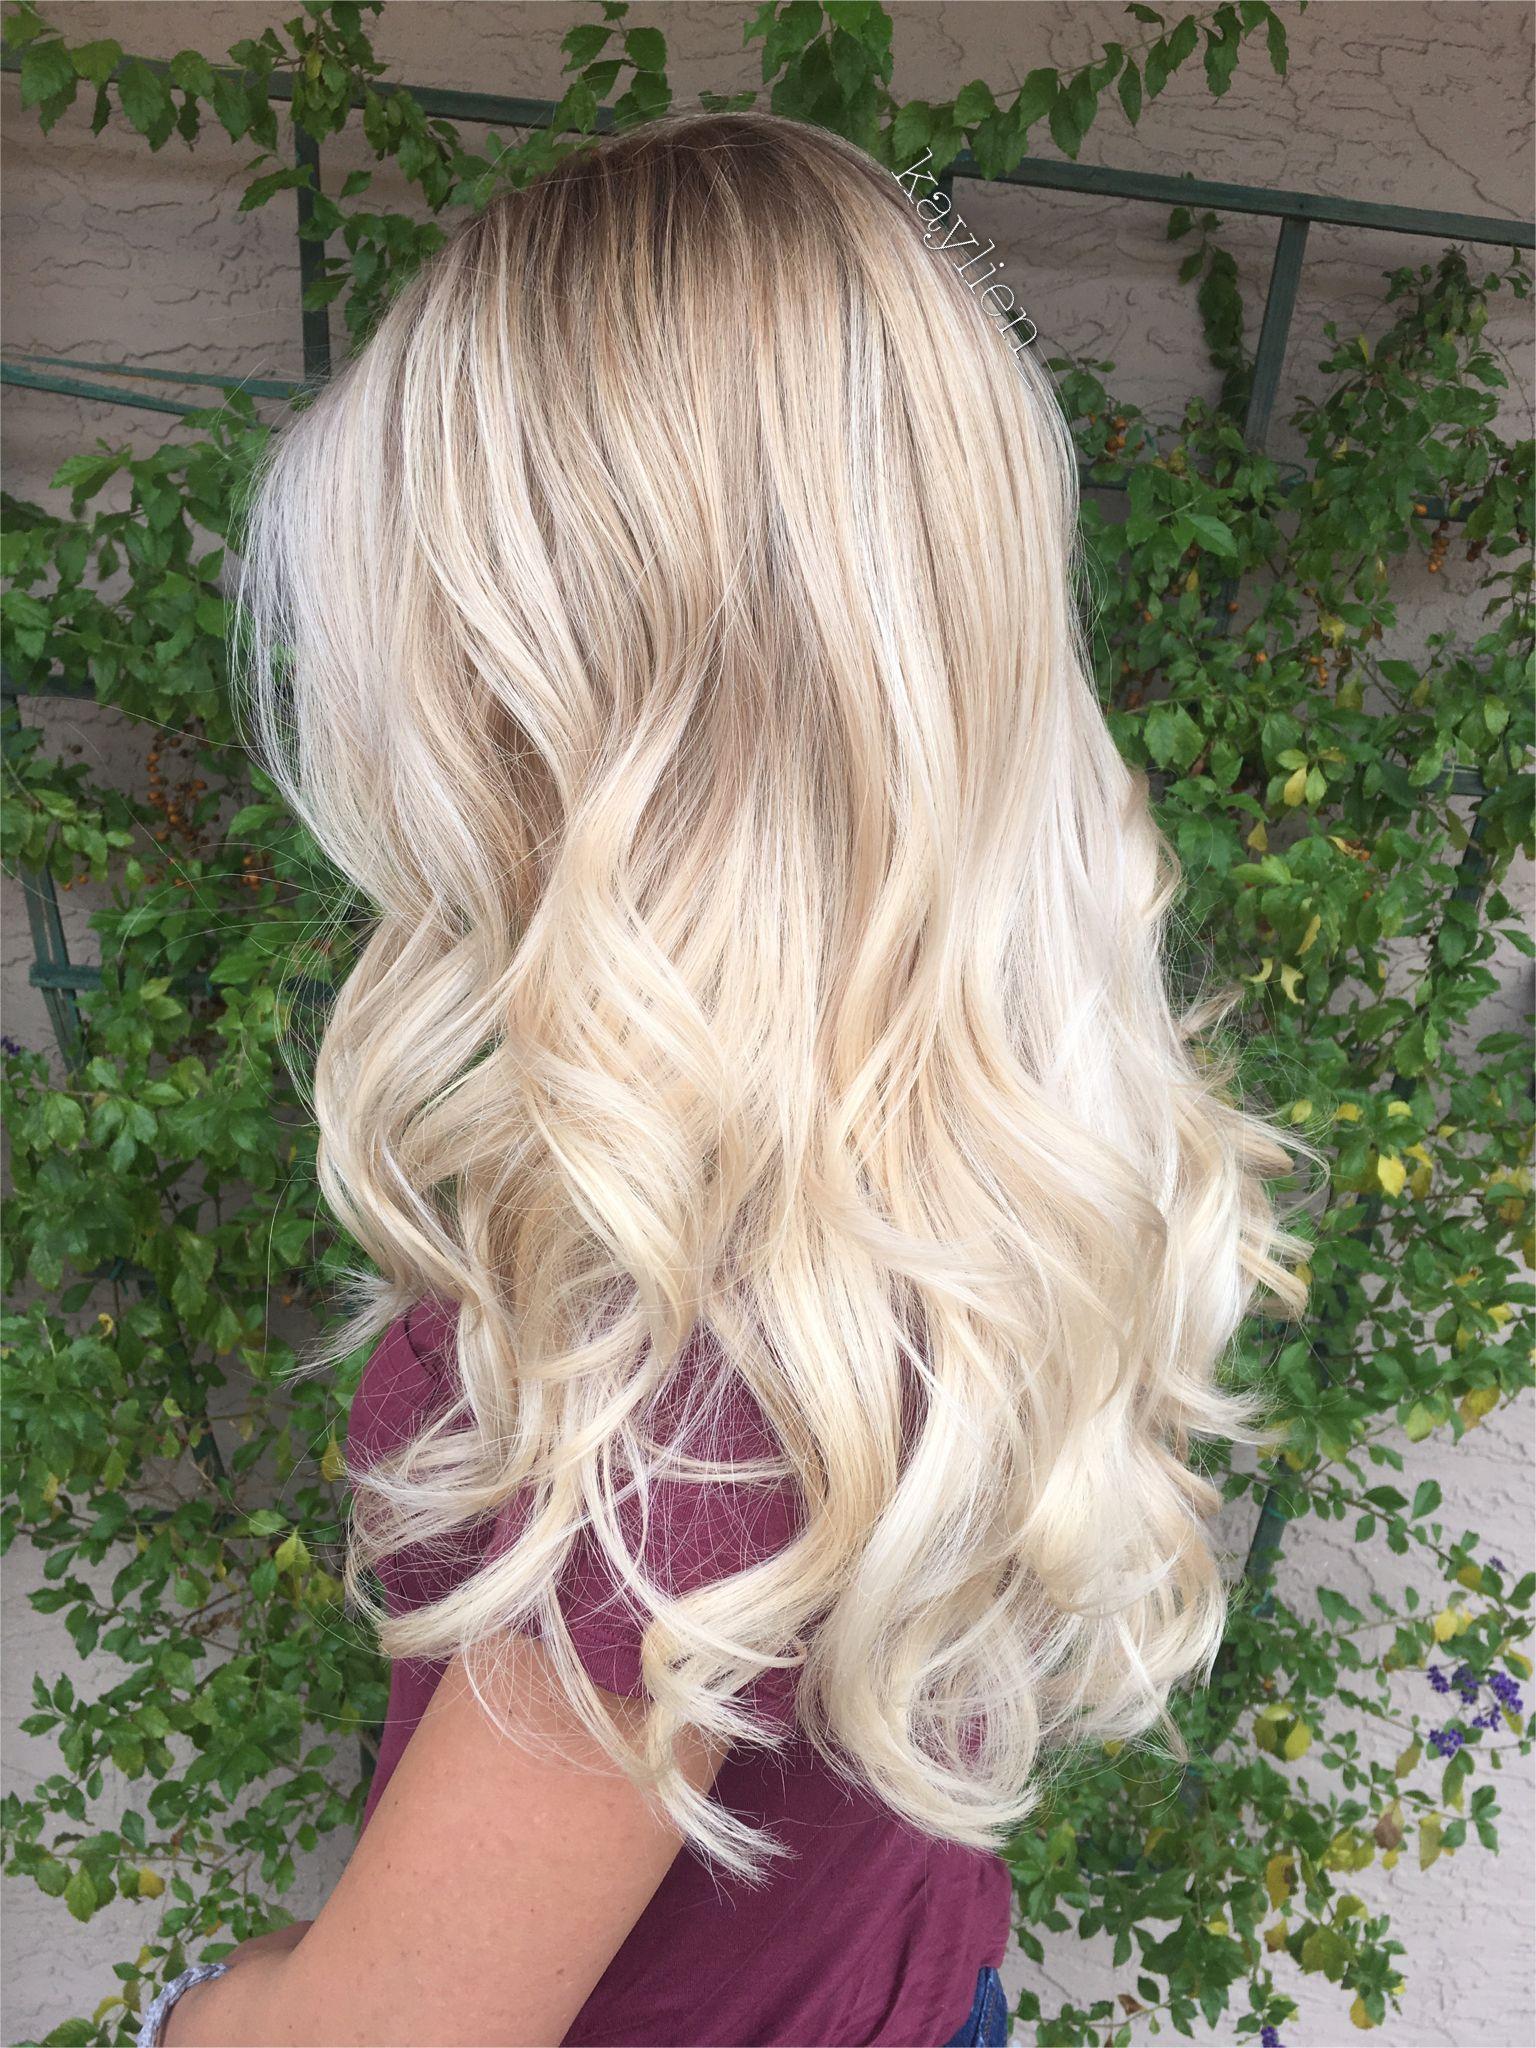 Blonde balayage on natural level 8 hair rnbjunkiex t…